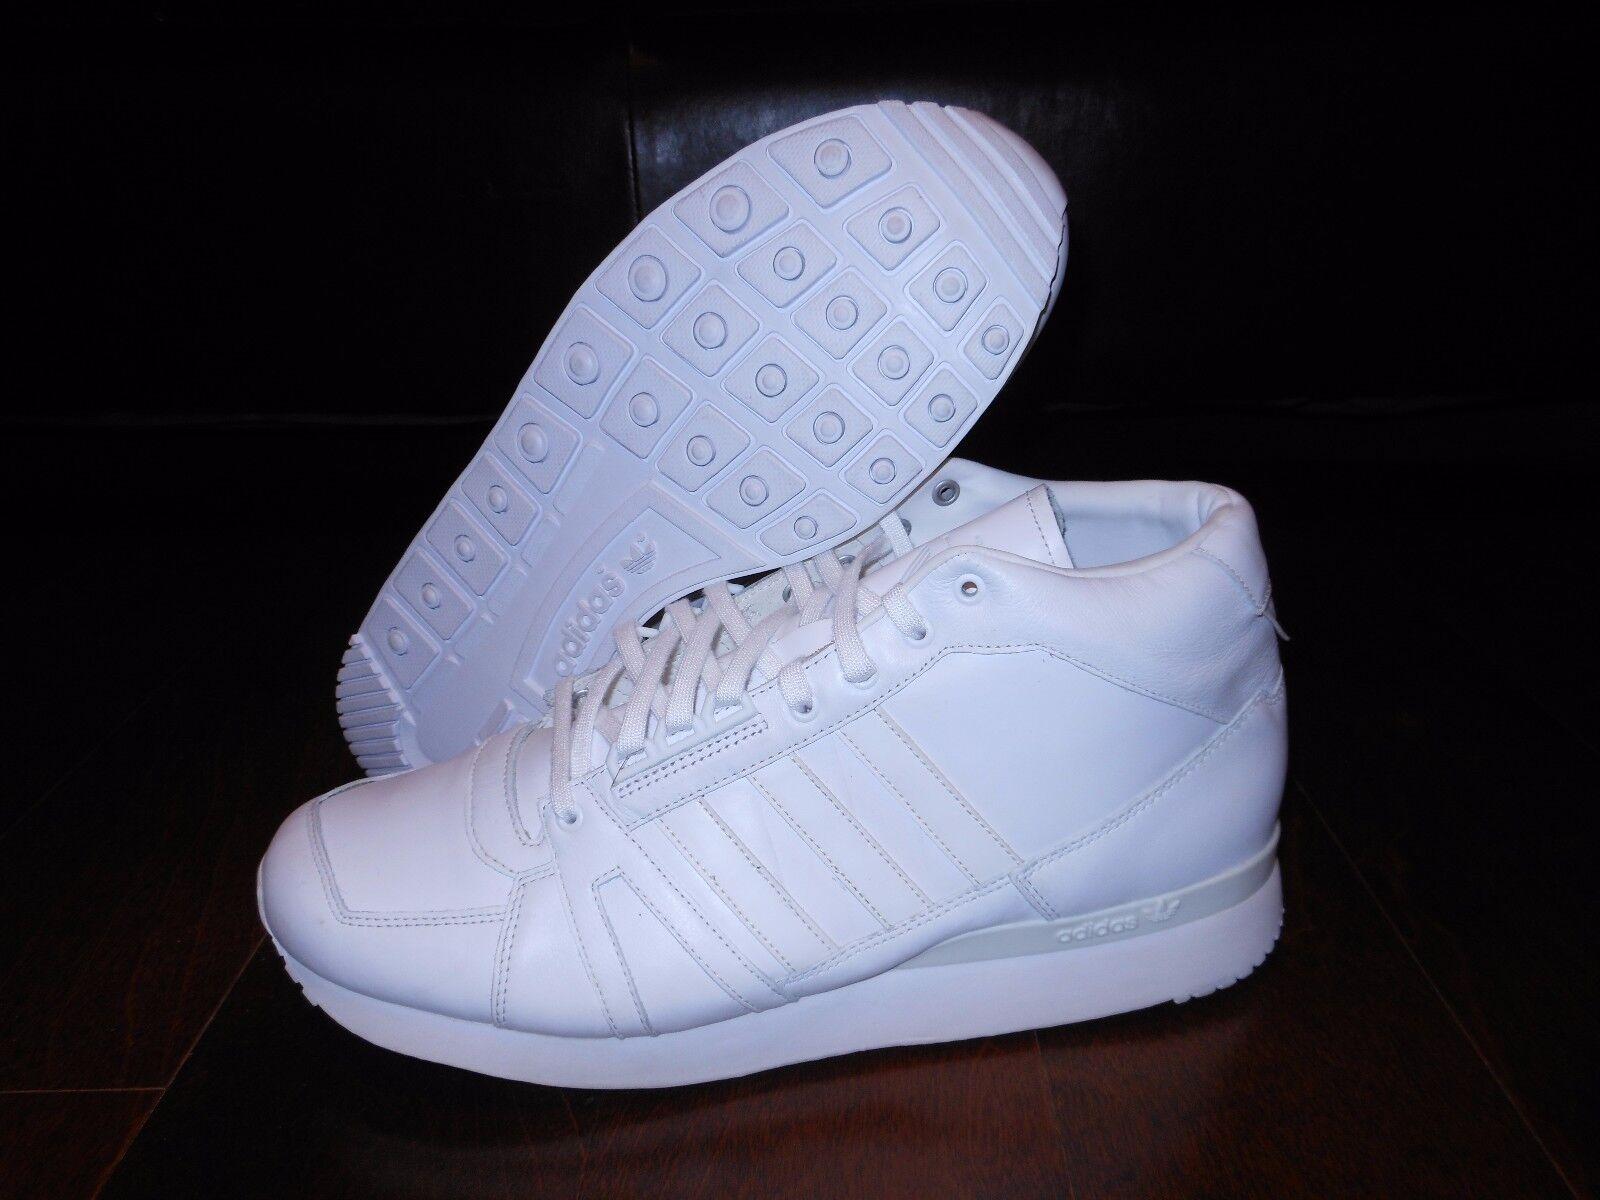 ADIDAS WHITE MOUNTAINEERING ZX500 S79450 shoes Size 12 US 47 EUR White